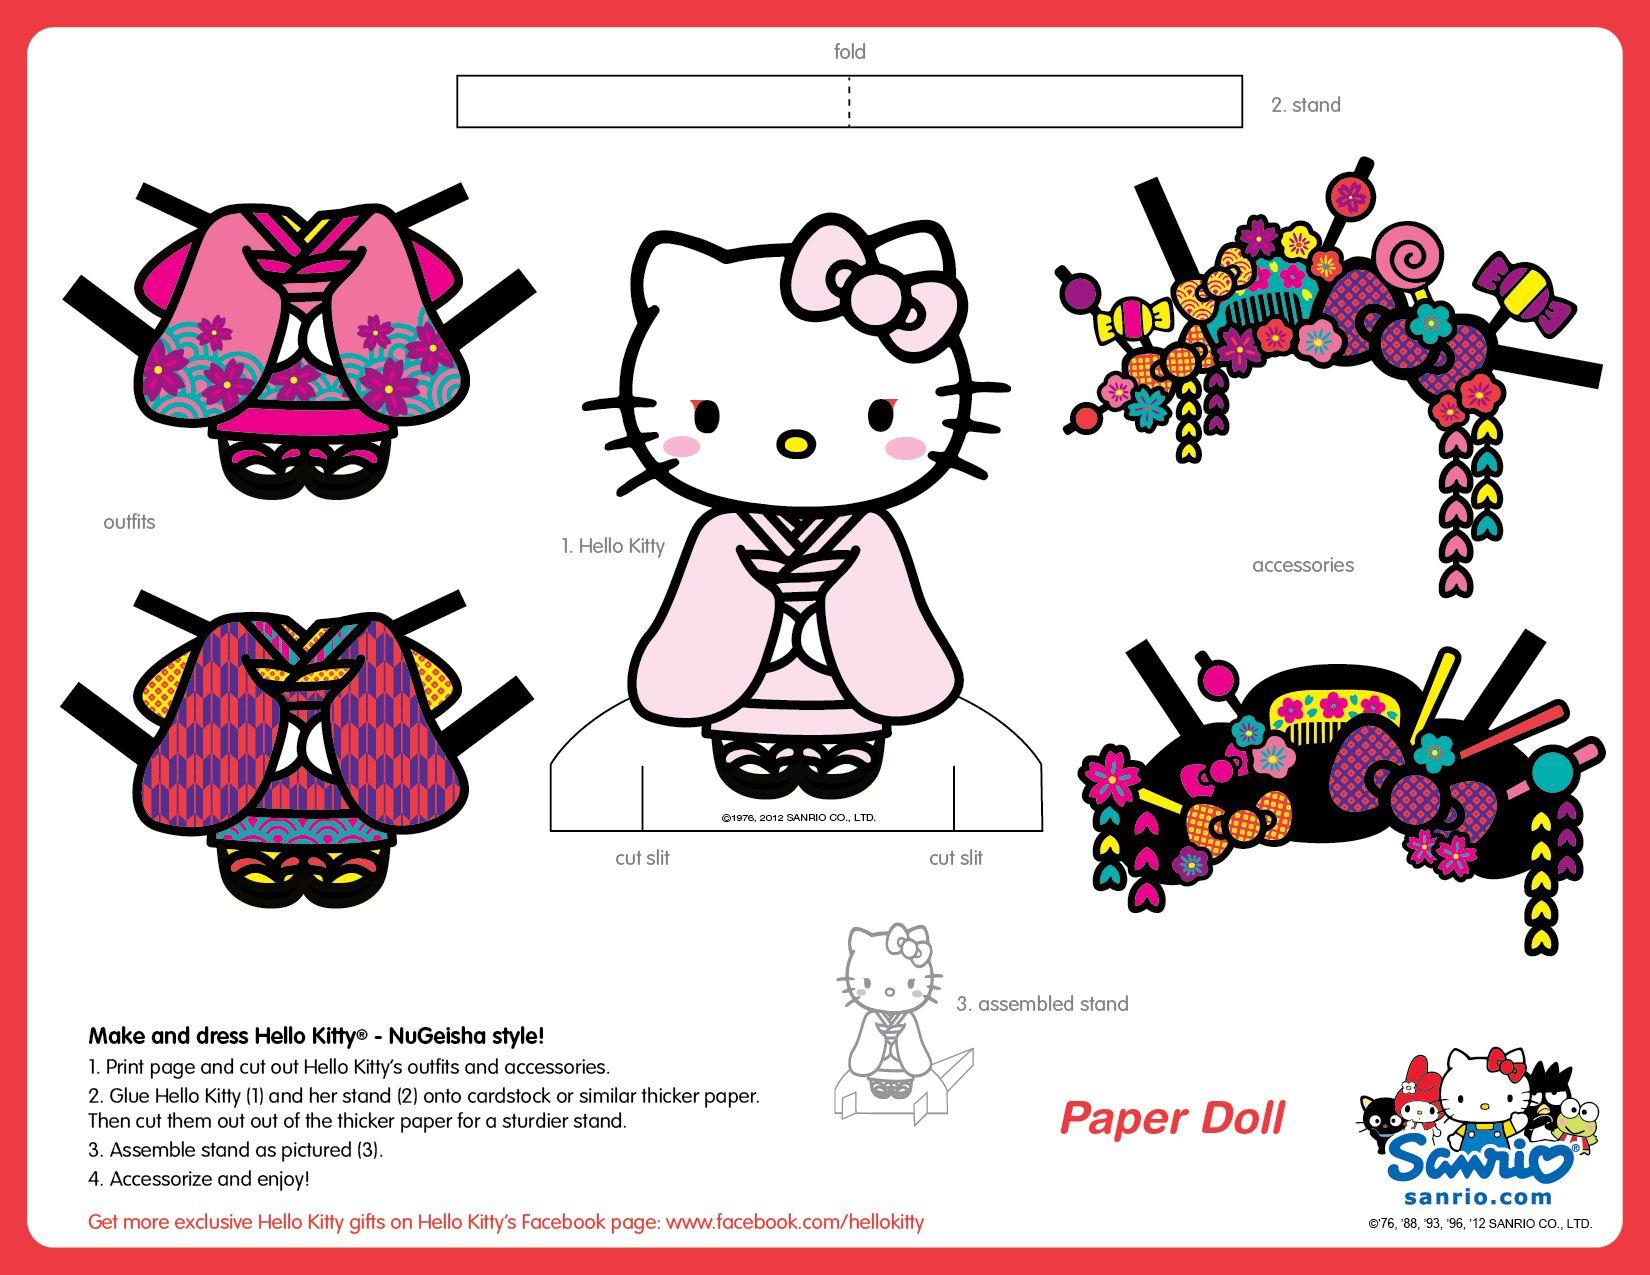 hello kitty cut out template - hello kitty nugeisha version paper doll sanrio